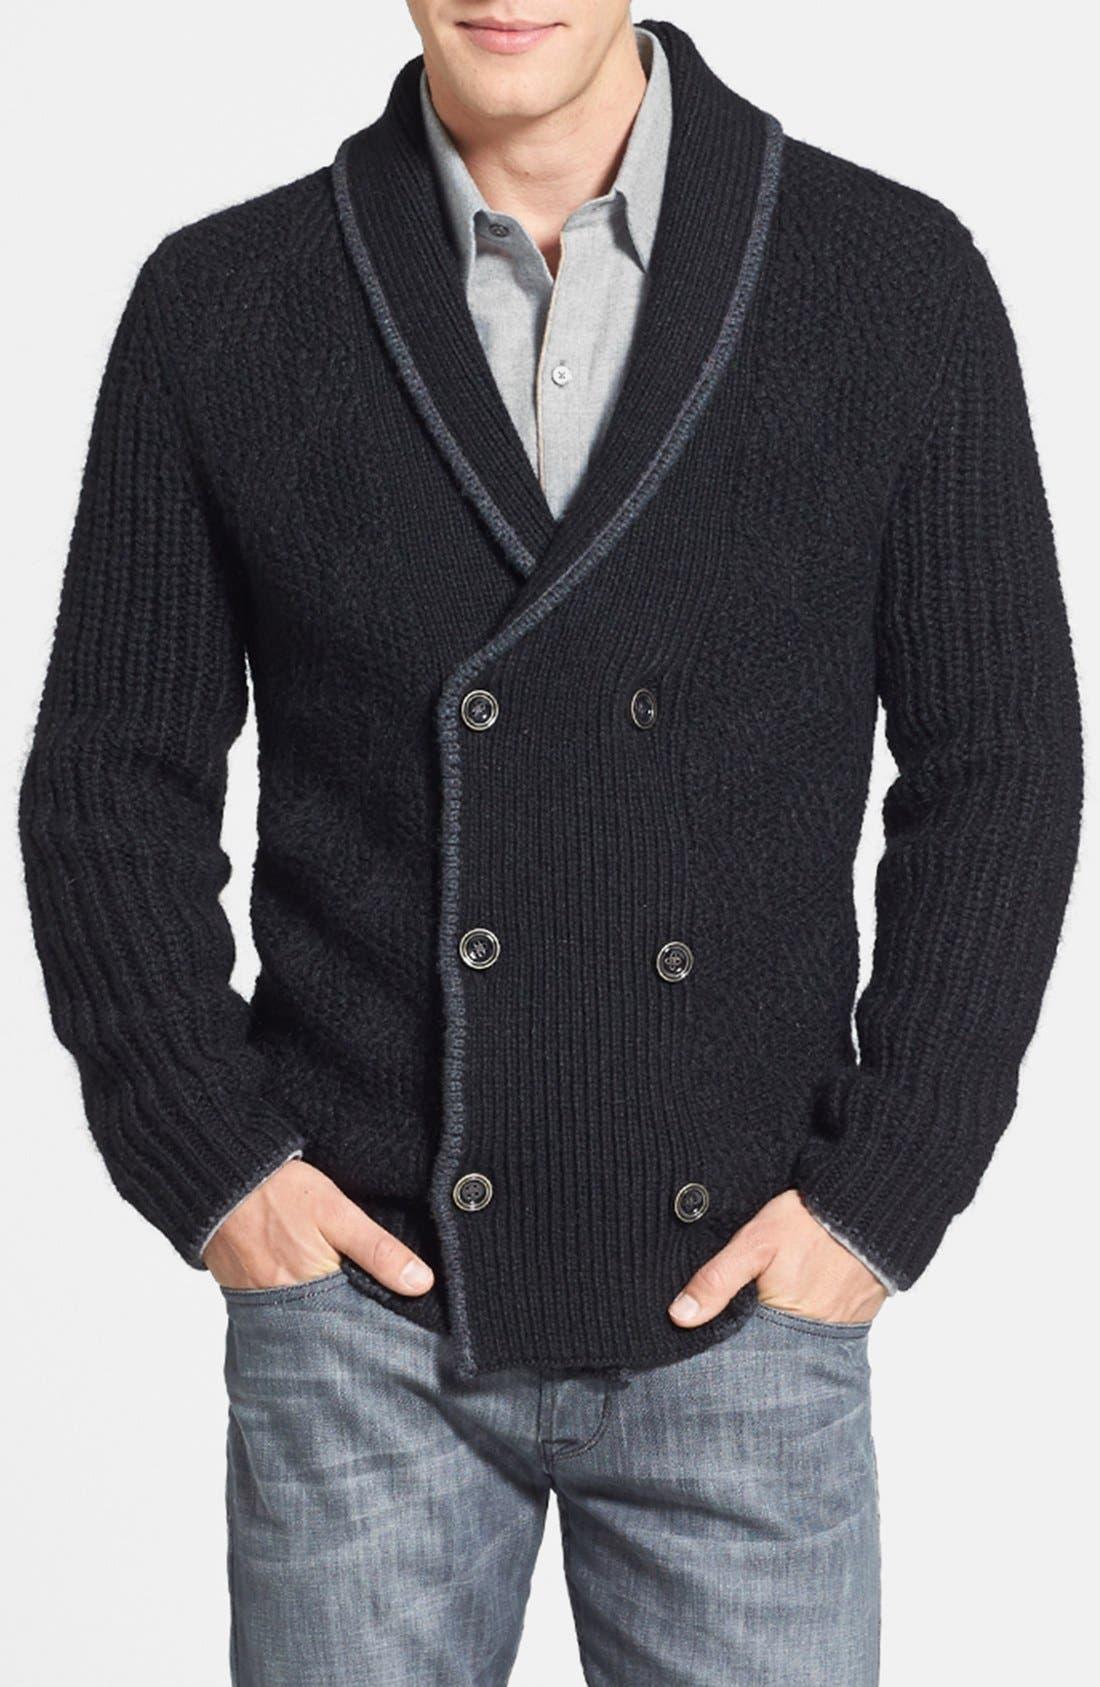 Alternate Image 1 Selected - Tommy Bahama 'Hudson Square' Regular Fit Cardigan